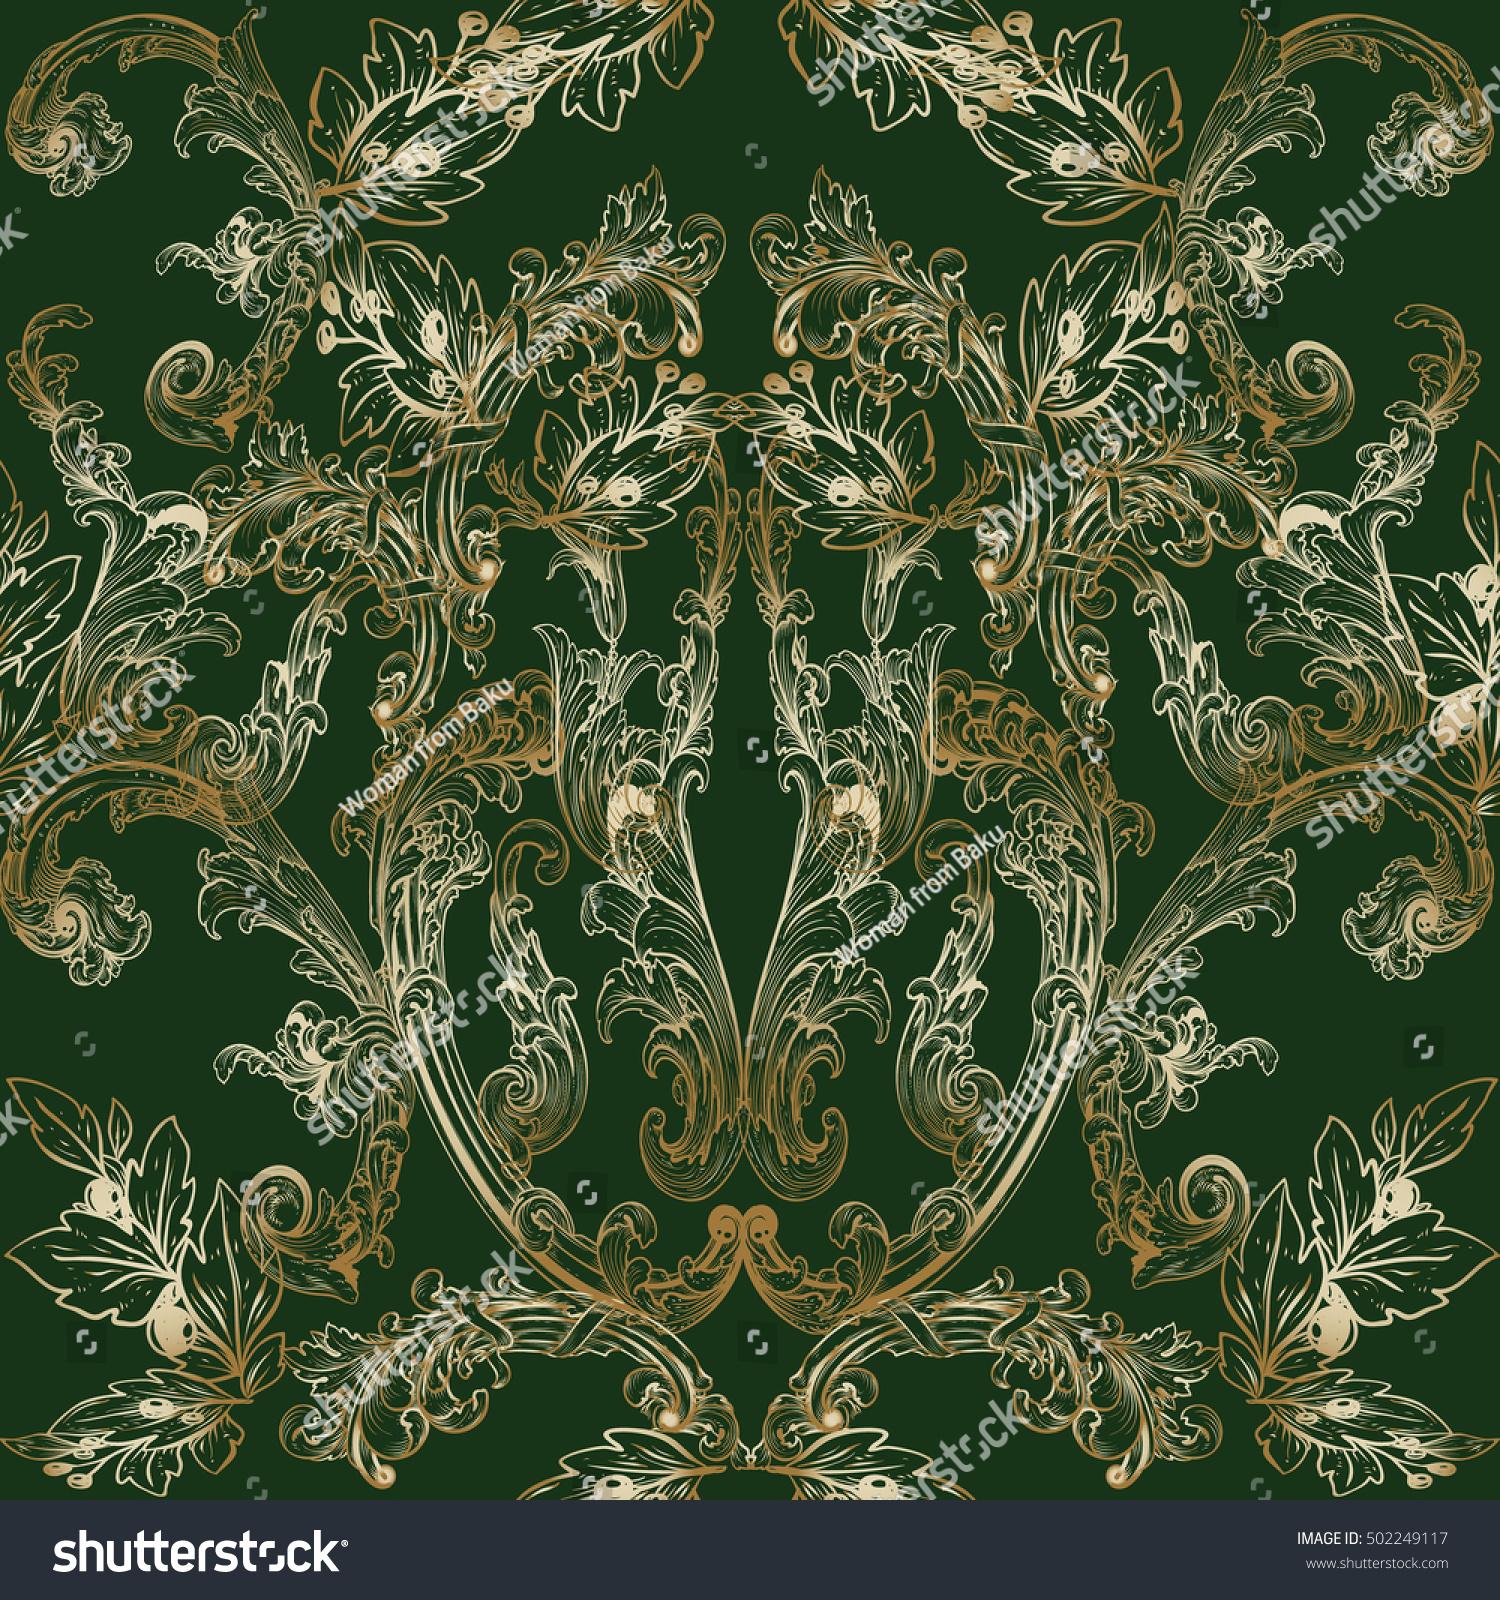 Elegant Baroque Damask Floral Dark Green Royalty Free Stock Image